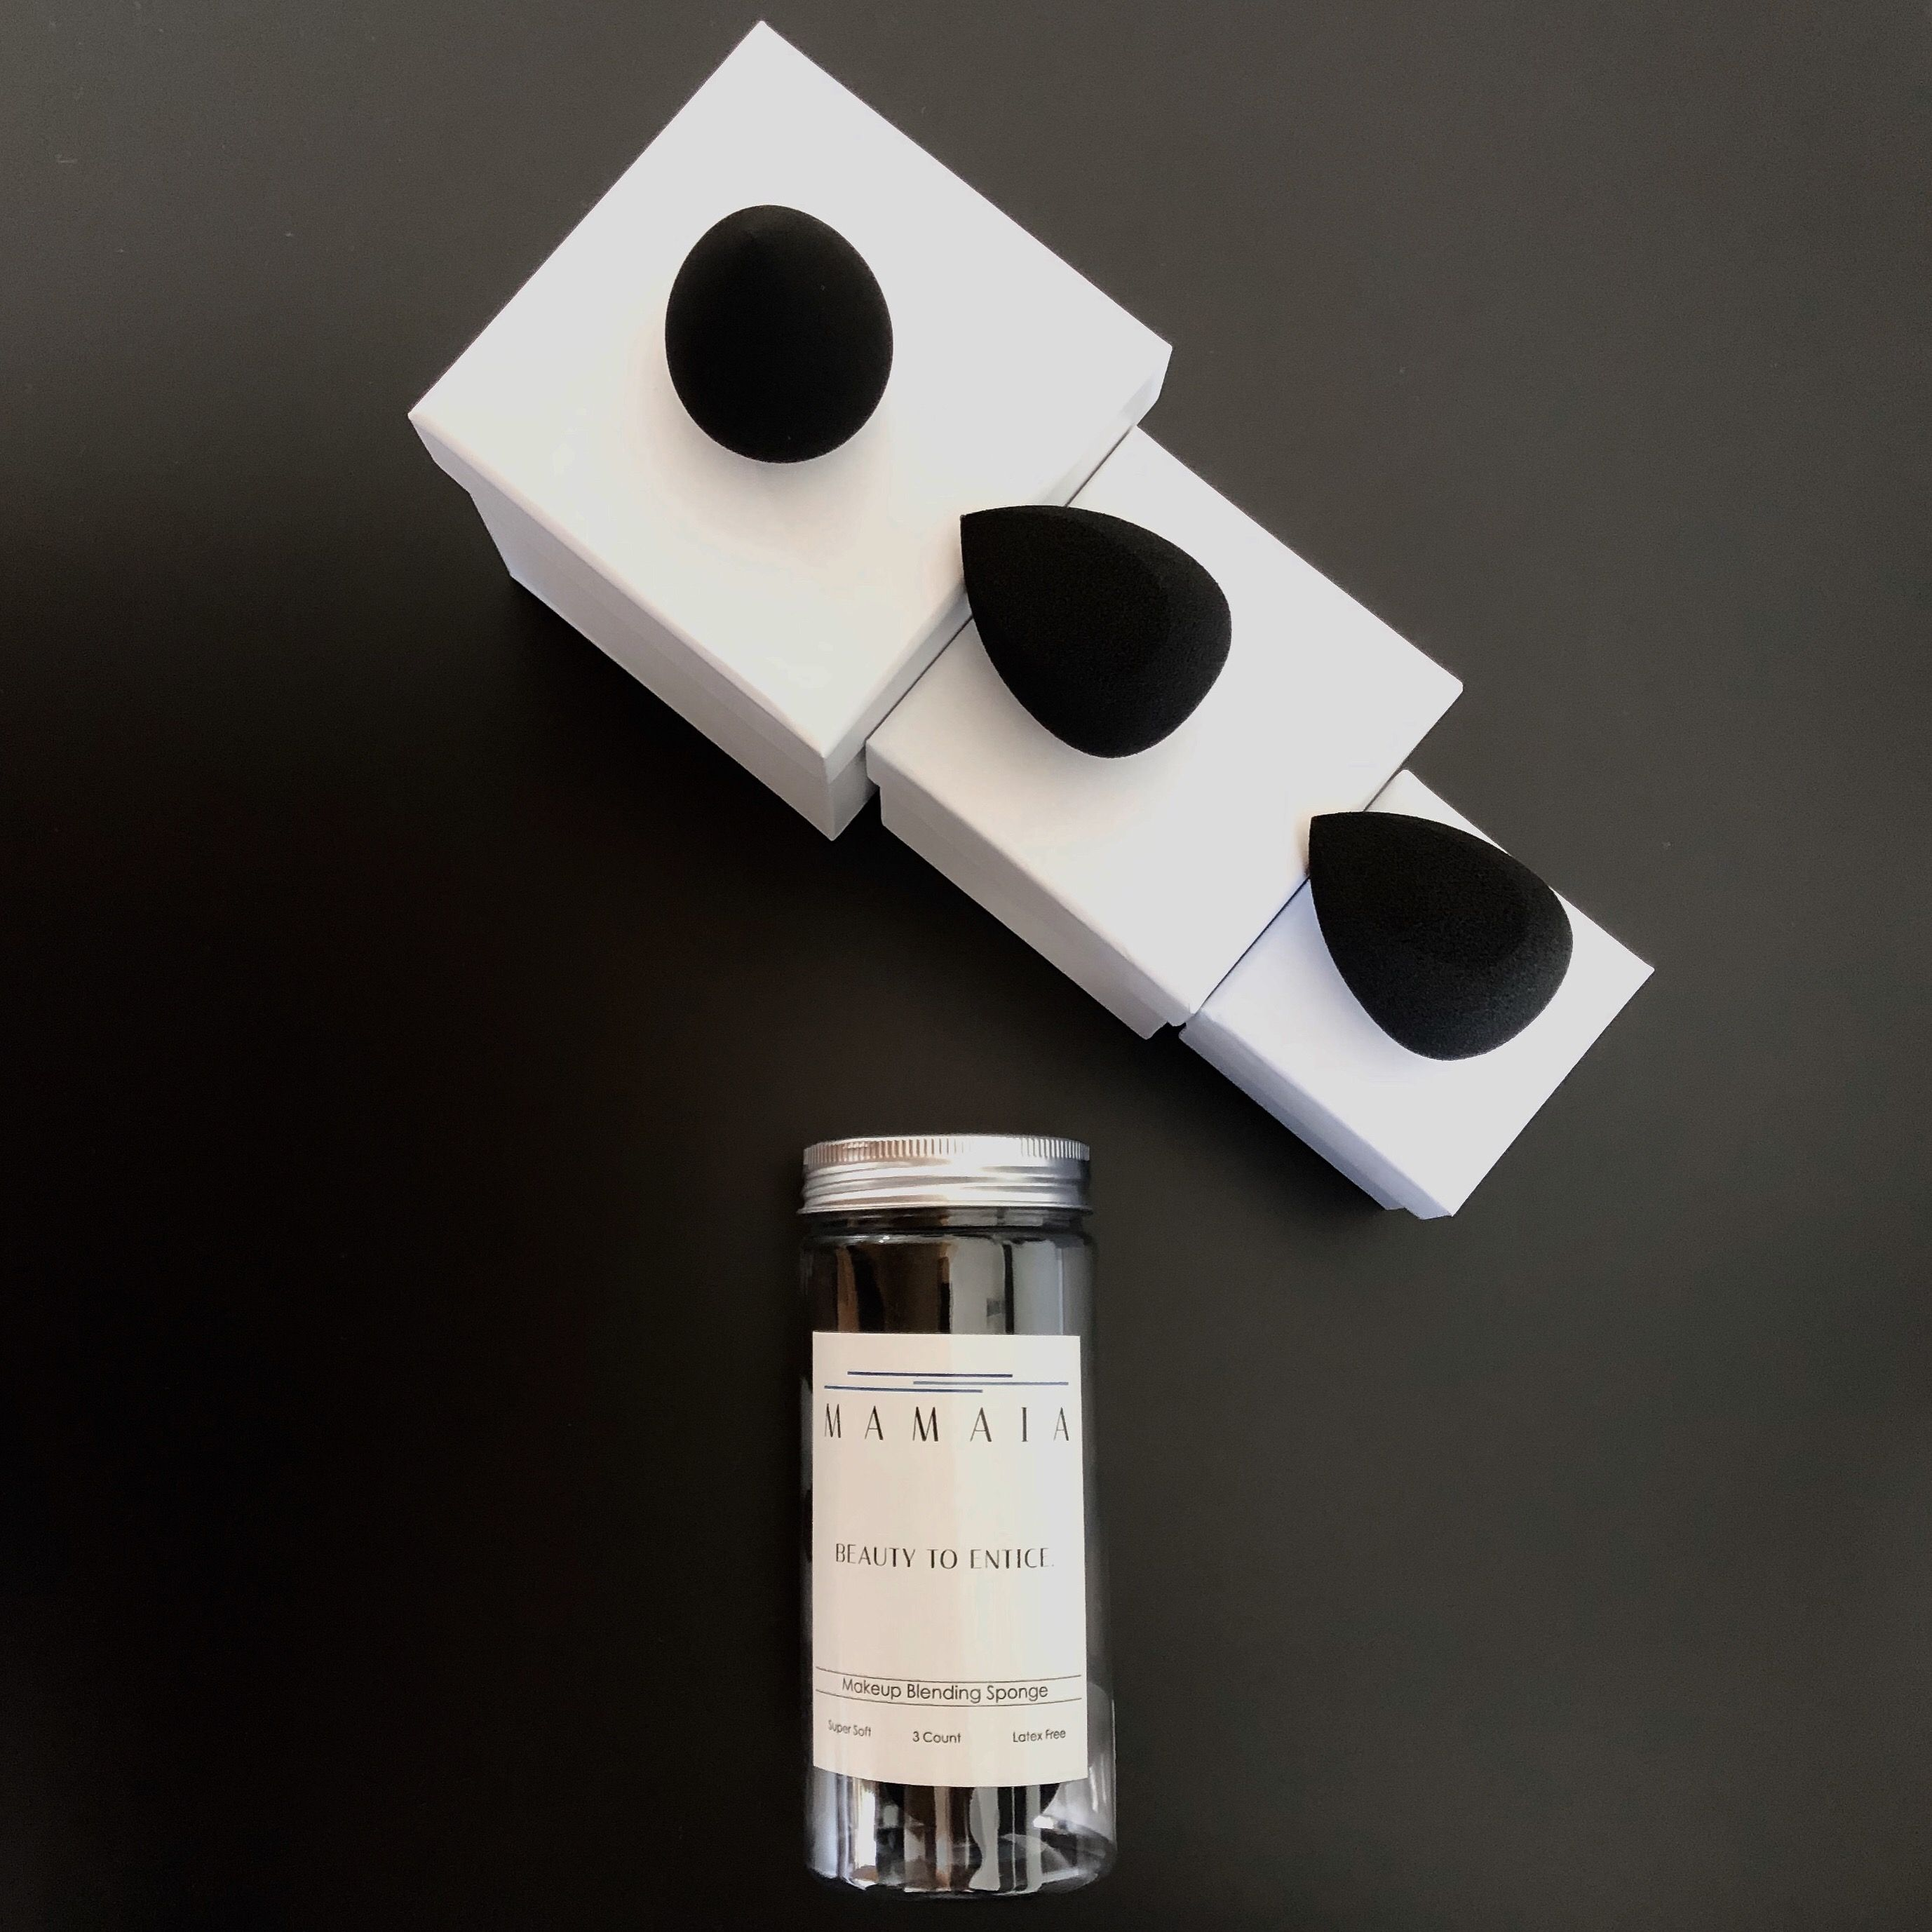 Makeup Blending Sponge Black, 3pc Set Makeup sponge